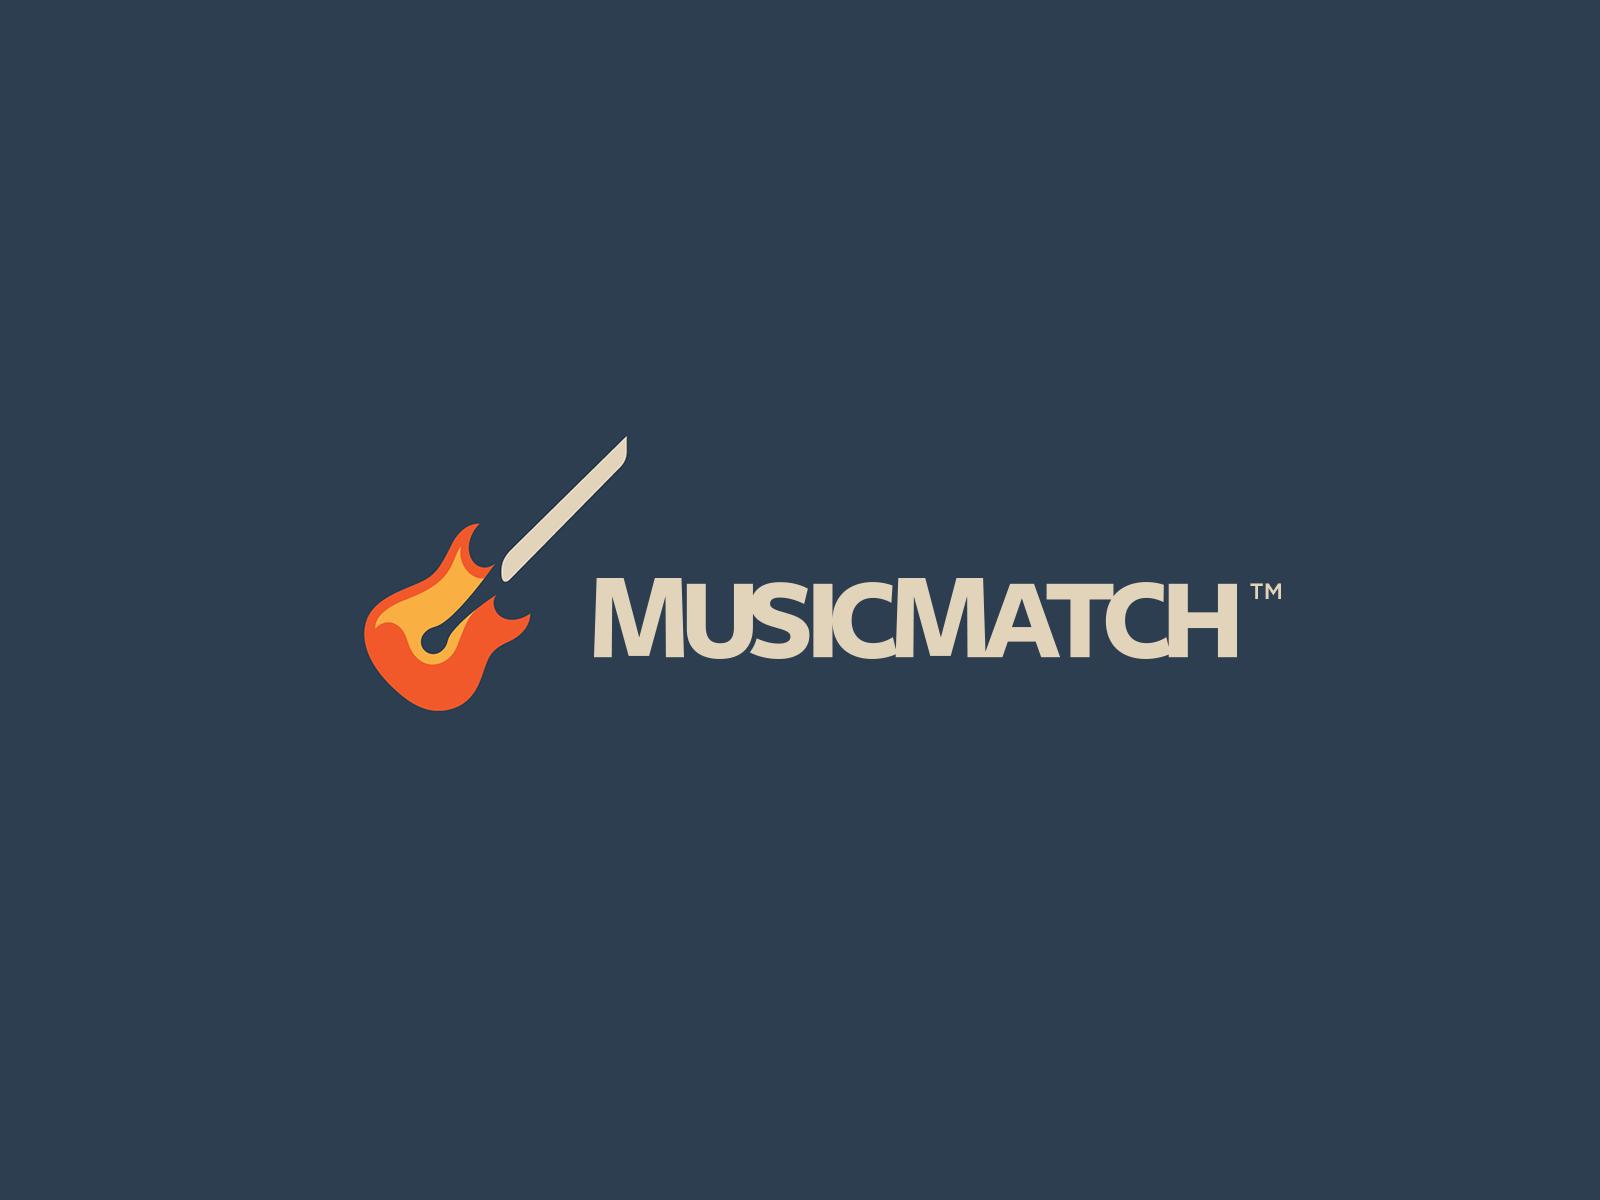 Musicmatch type